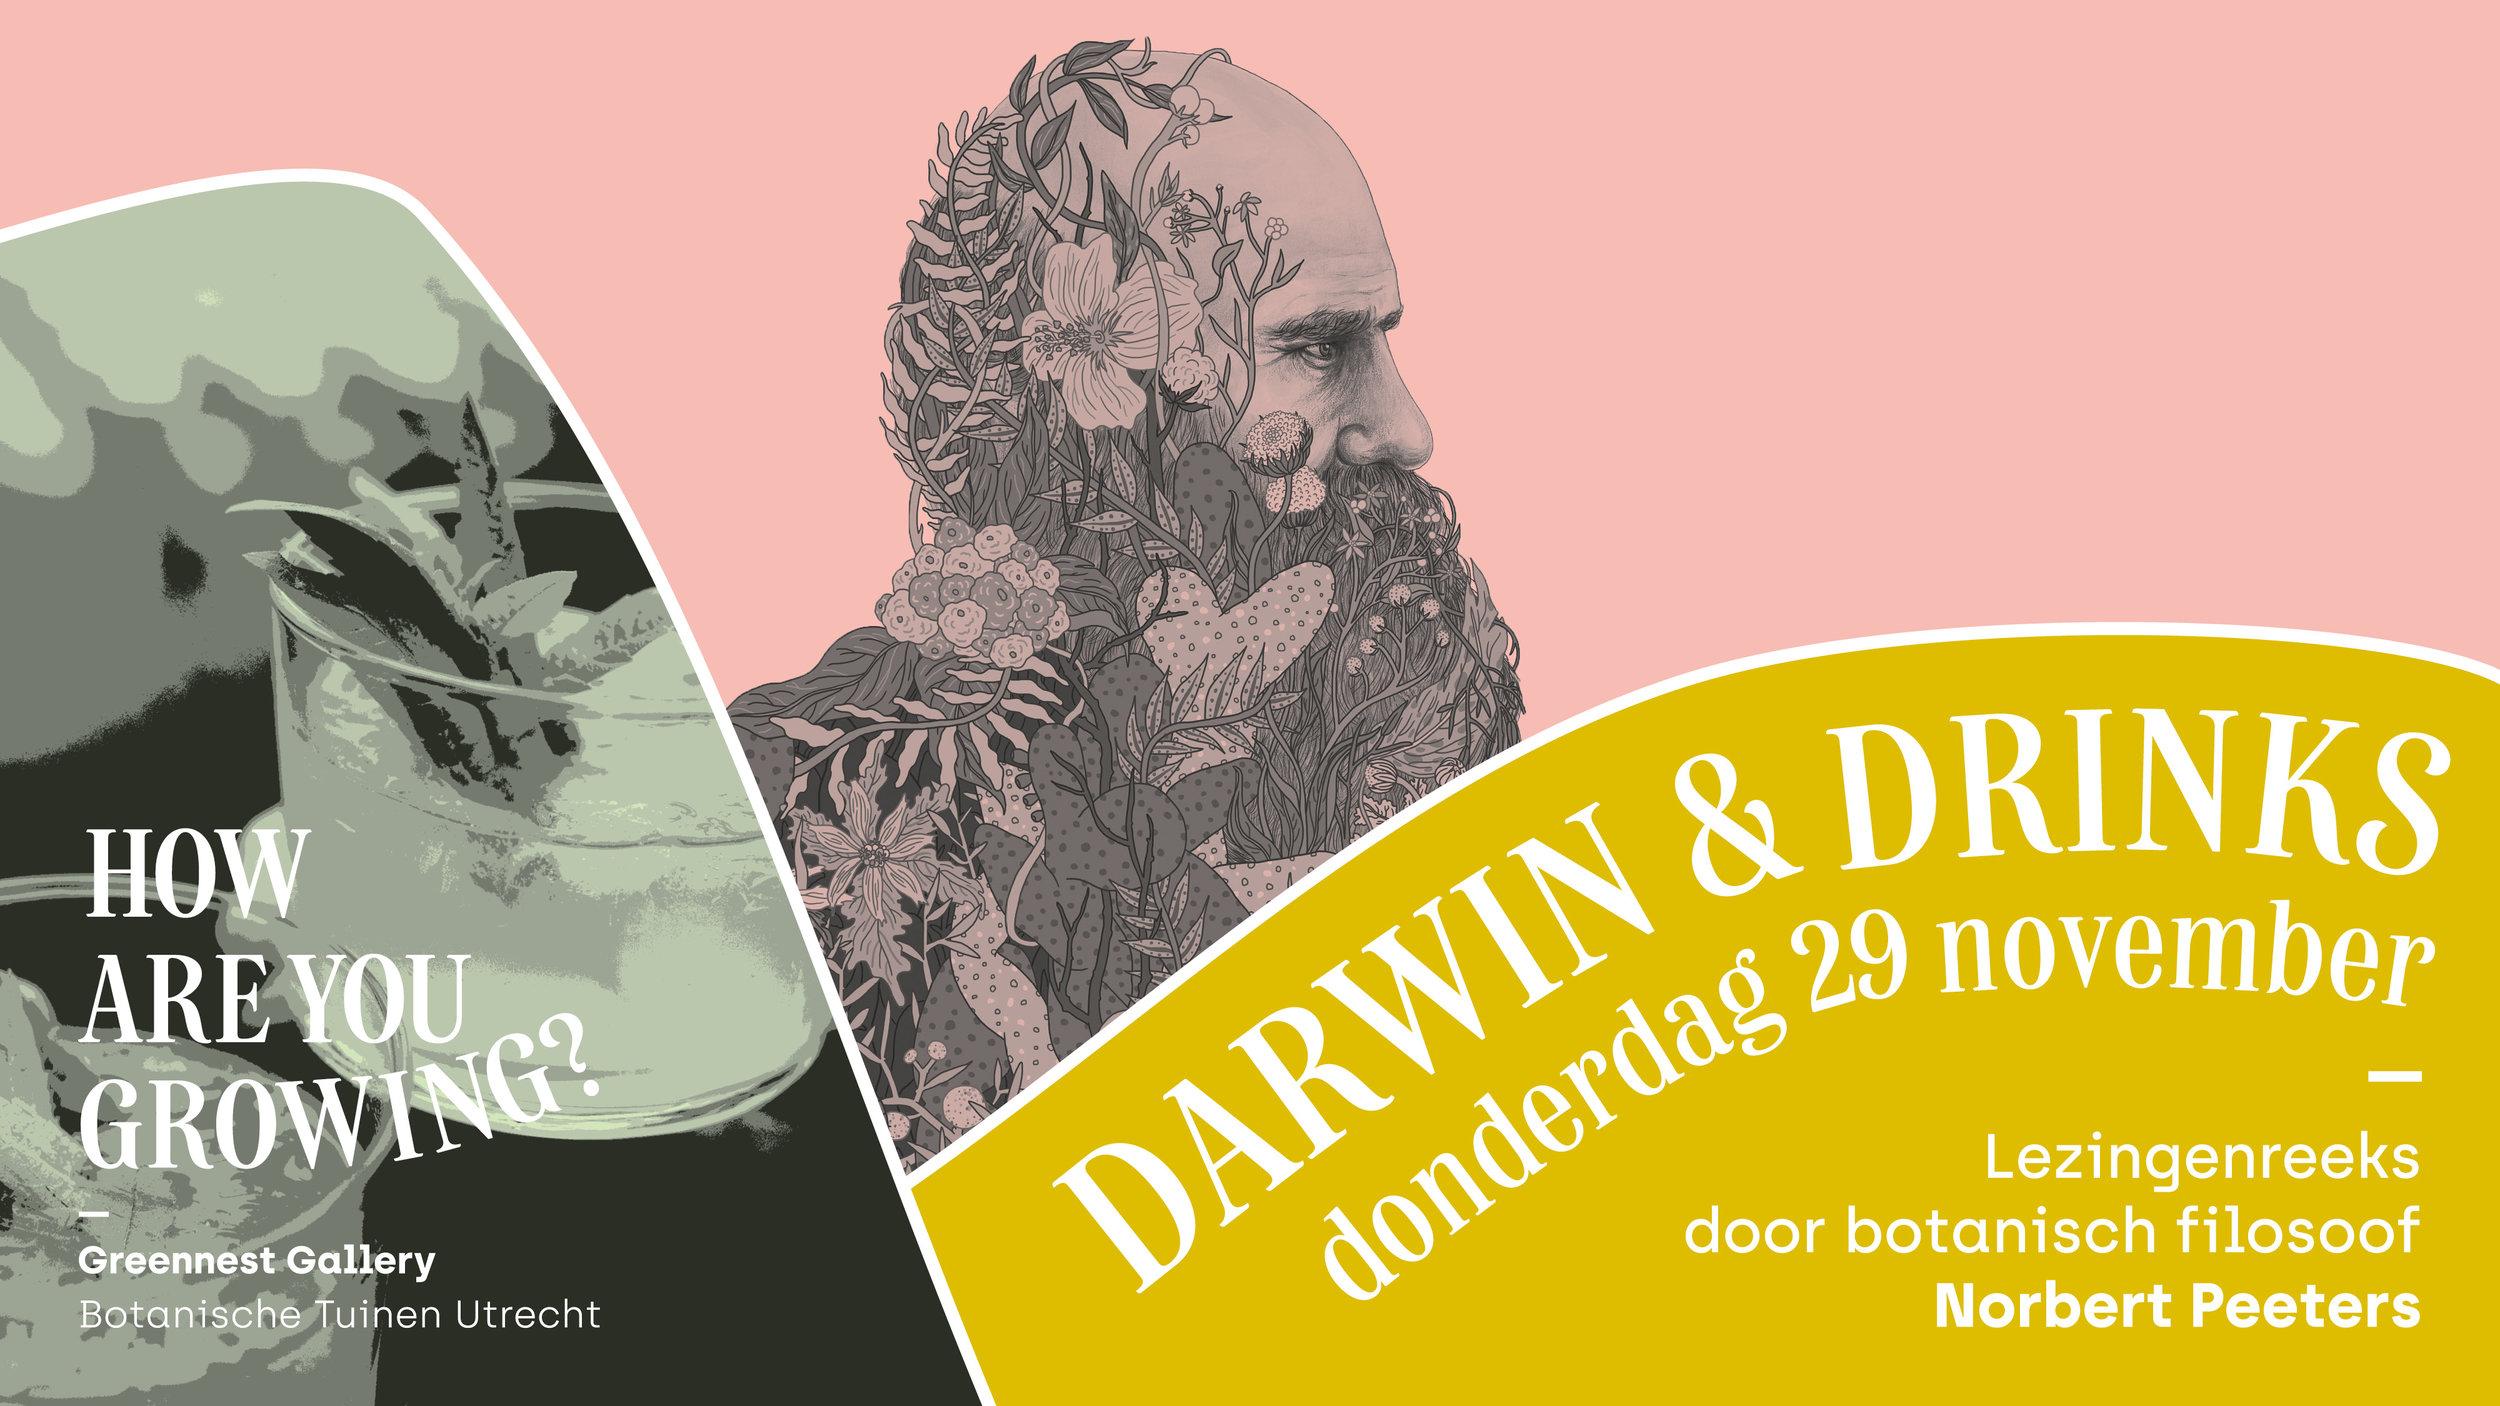 04_29nov_Darwin&Drinks_banner_150dpi.jpg